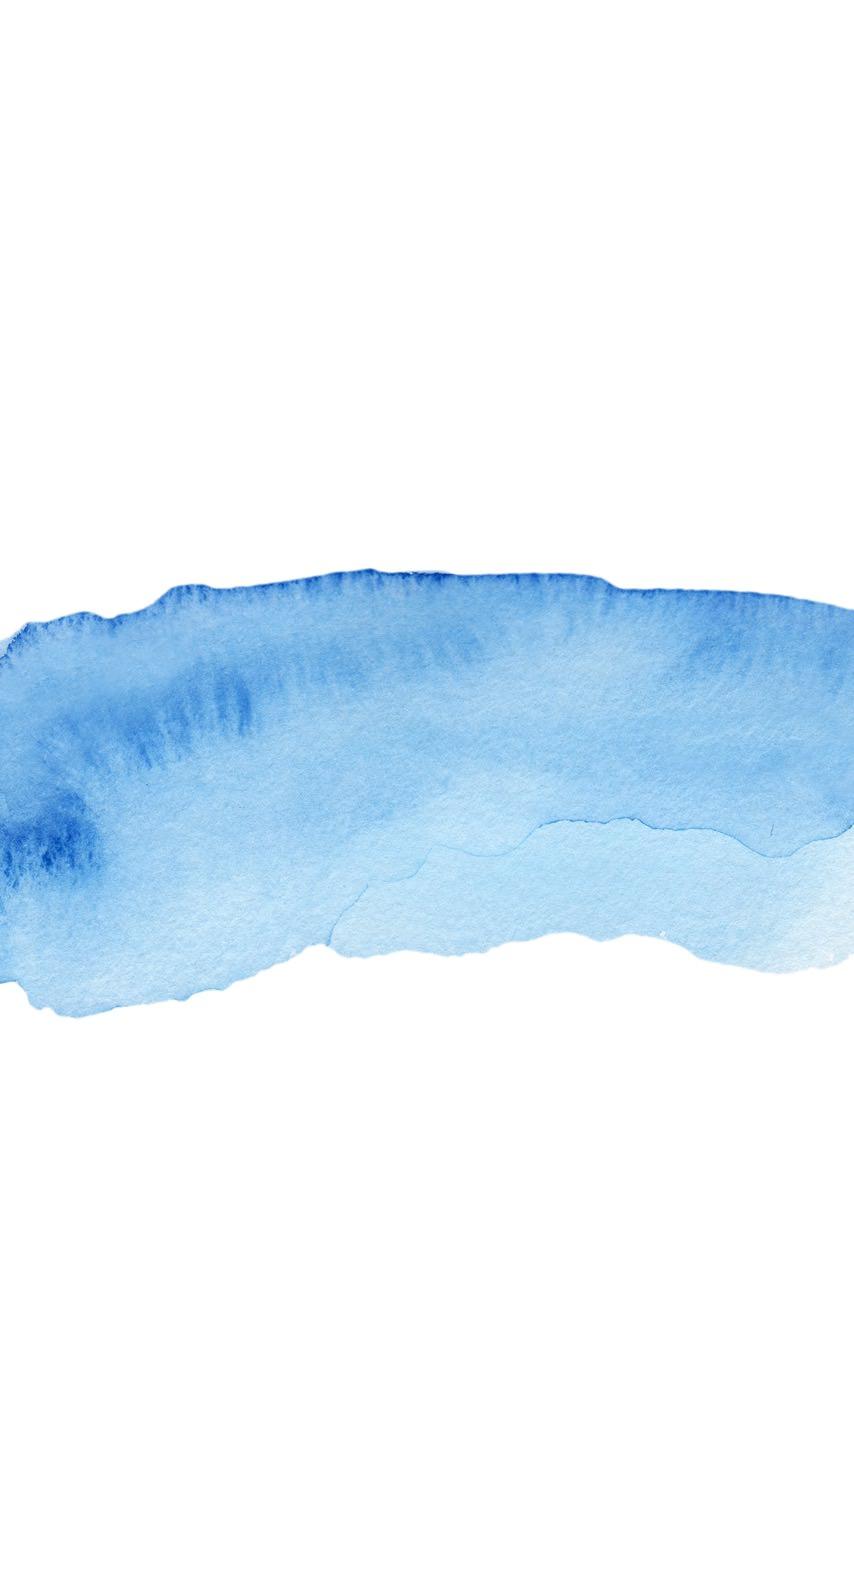 Paper Pattern Blue White Wallpaper Sc Iphone7